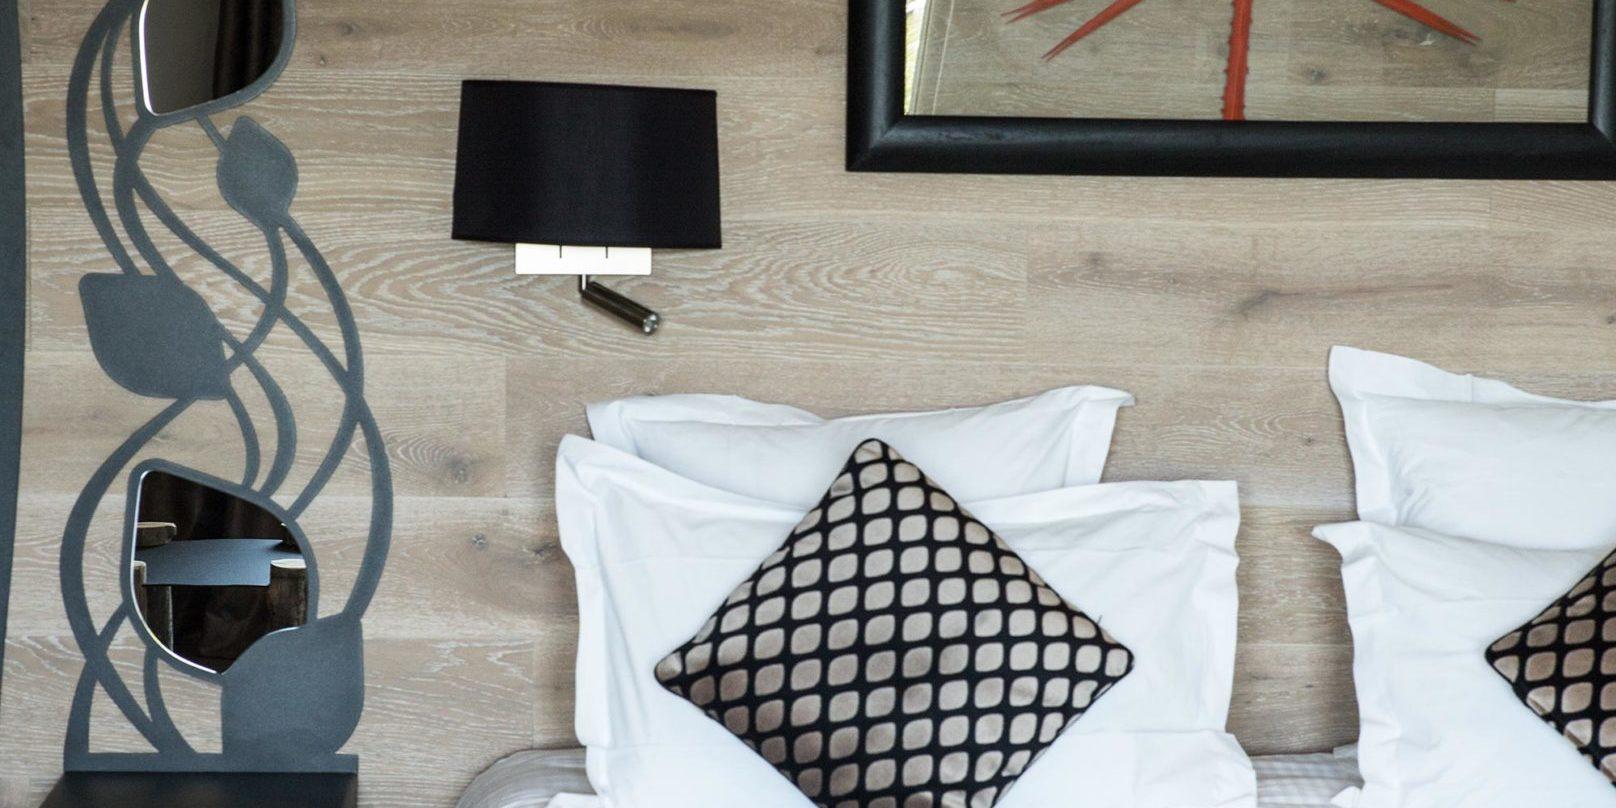 Hotel A Piattatella Monticello Balagne Corsica Frankrijk kamer design sober aardetinten